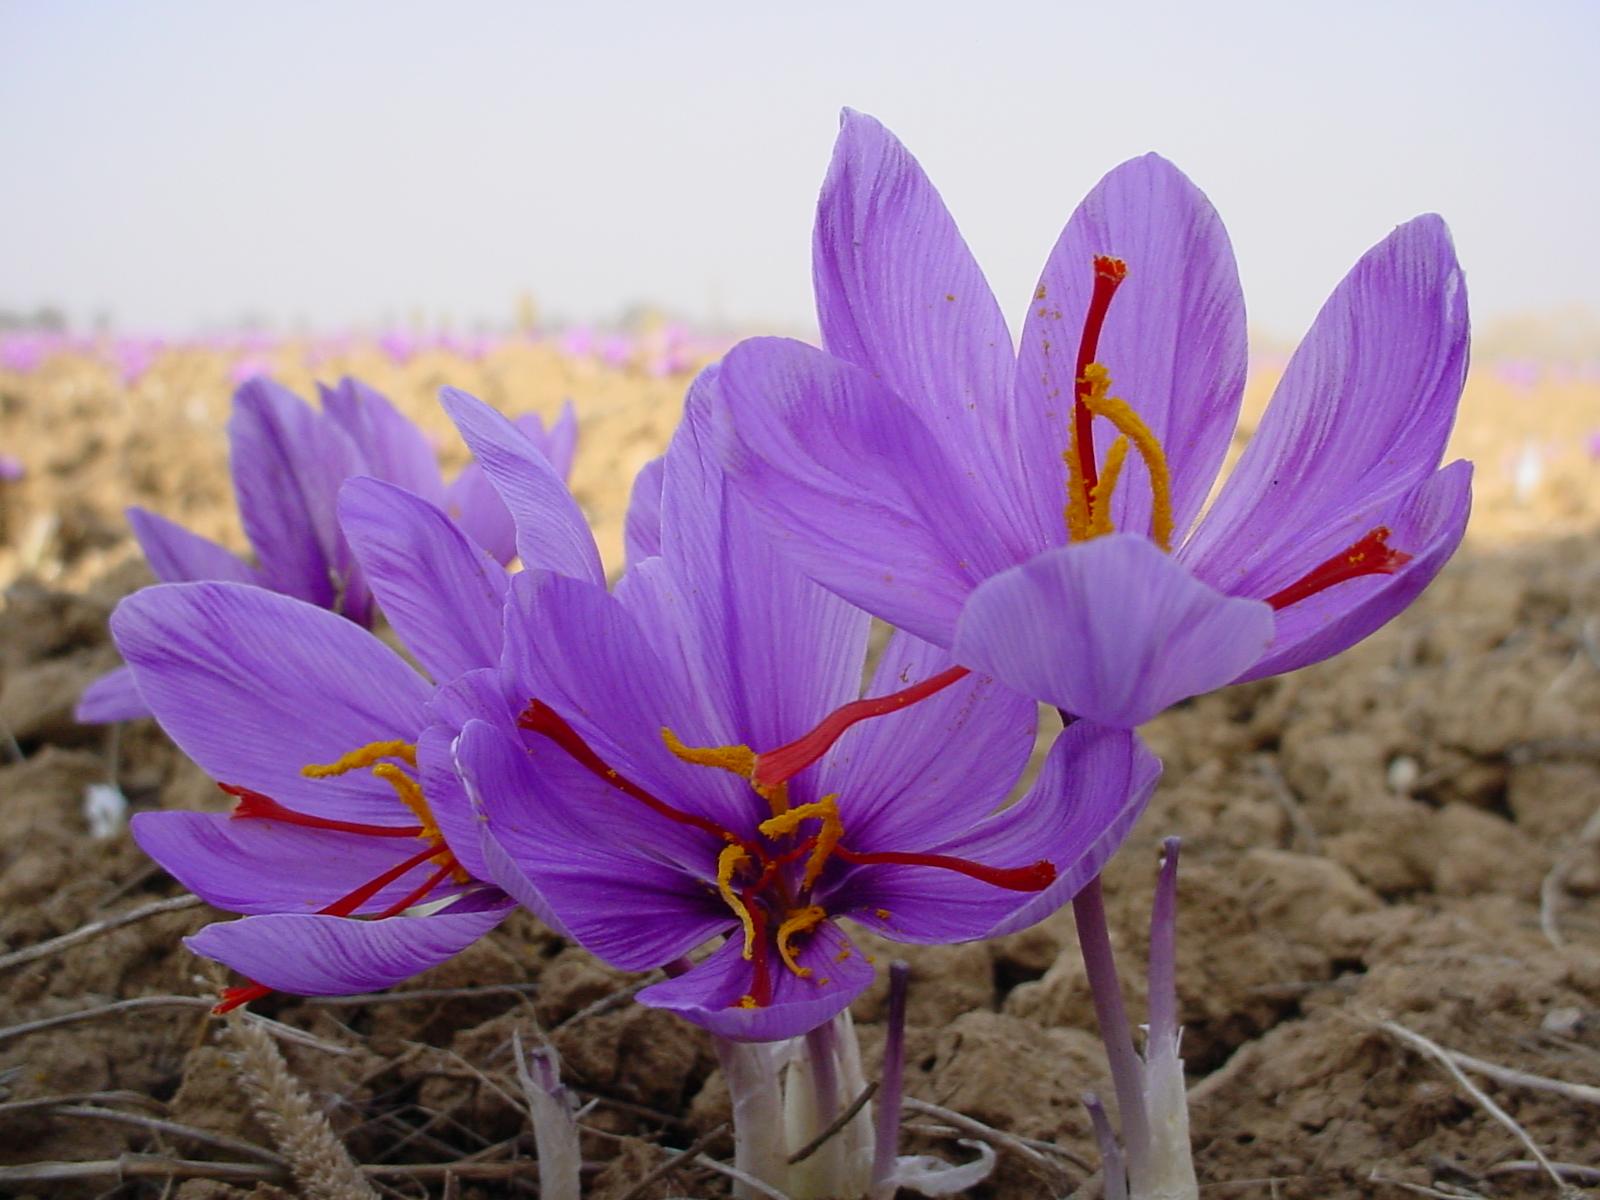 flowers for flower lovers Saffron flowers details